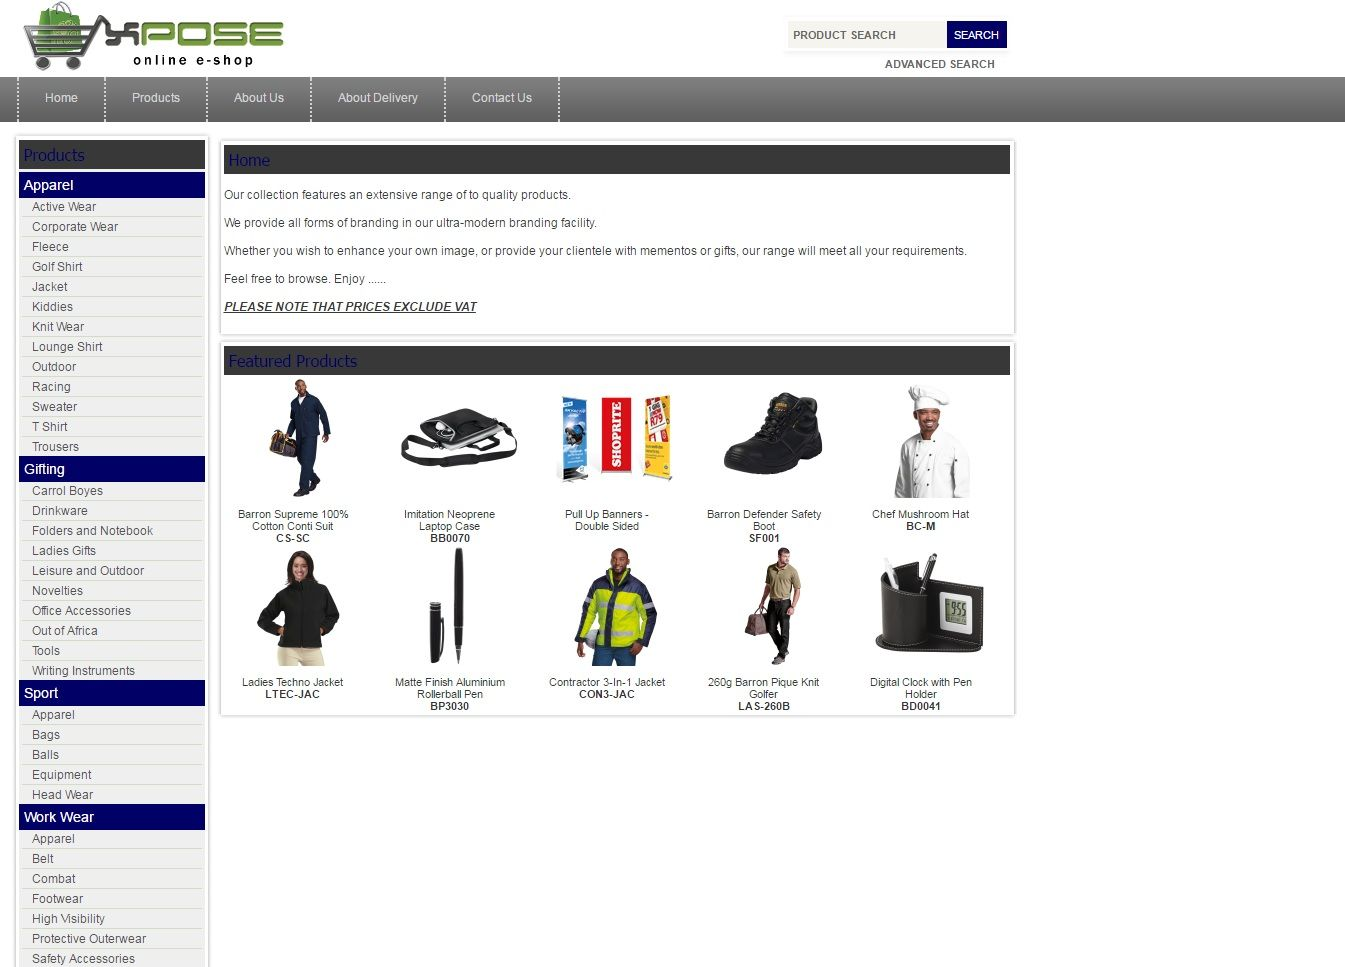 Xpose Online E-Store - (http://xpose.bcgshop.co.za/)